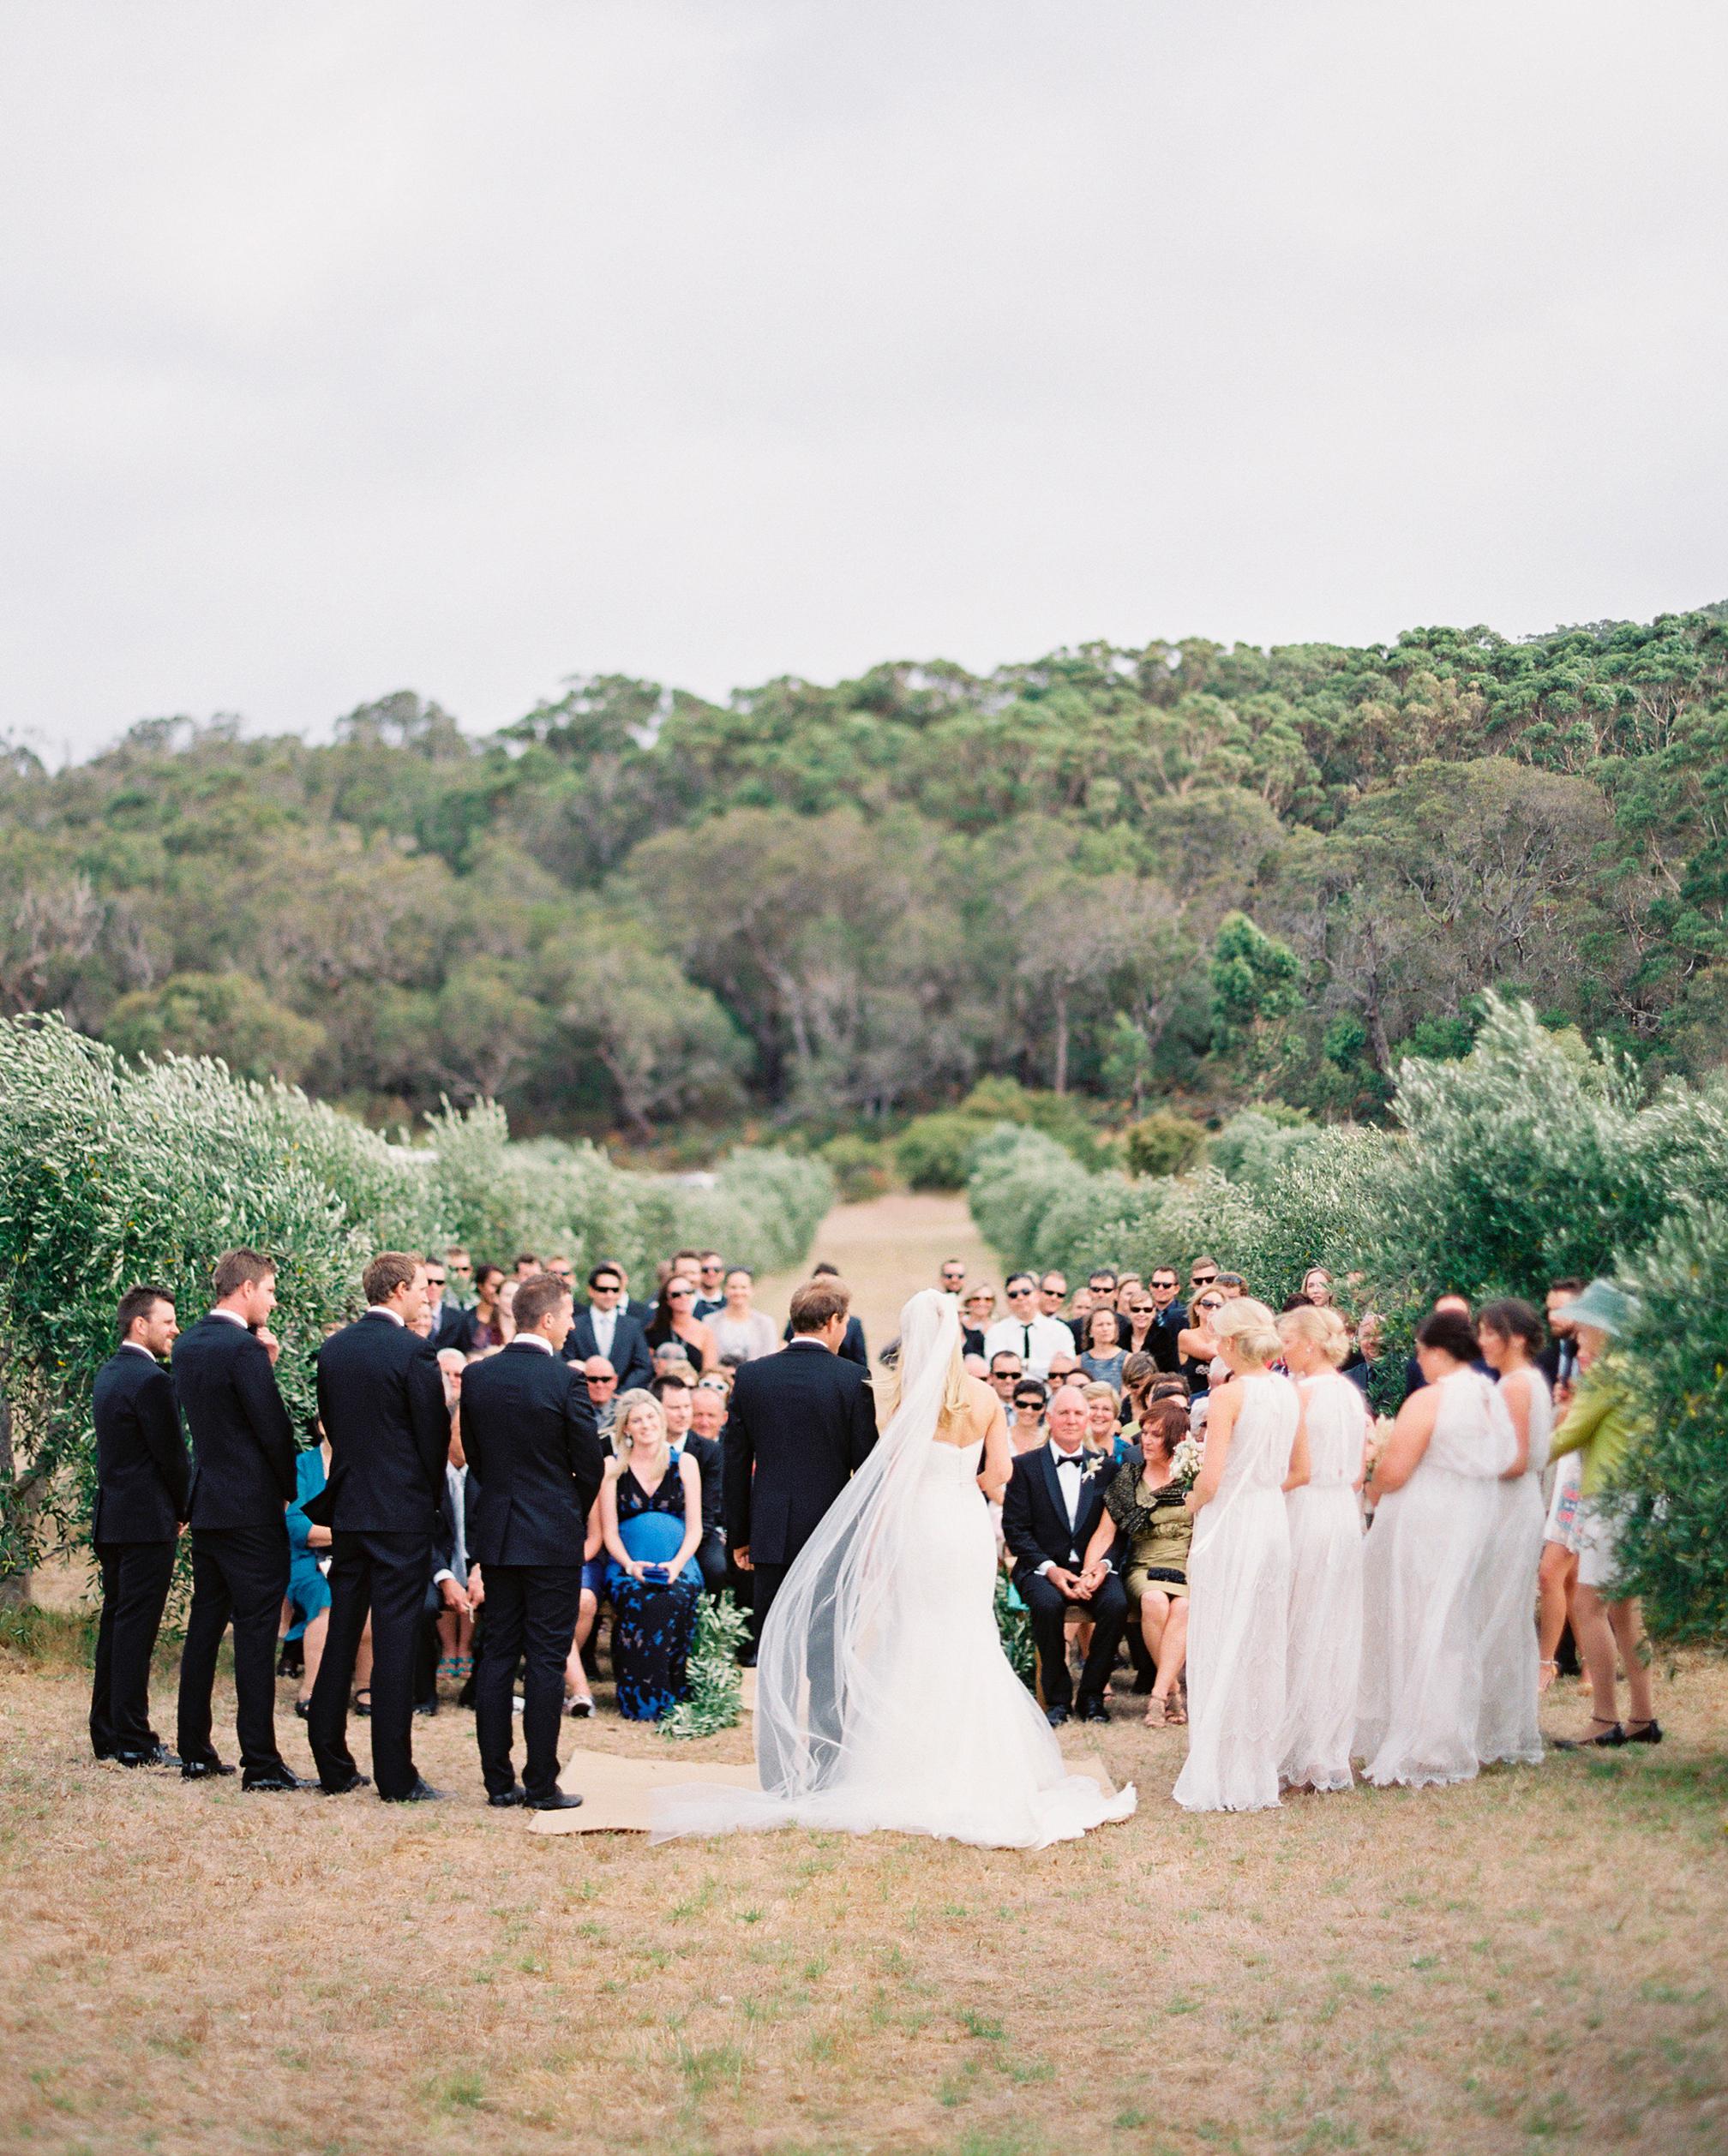 jemma-michael-wedding-ceremony-002626016-s112110-0815.jpg